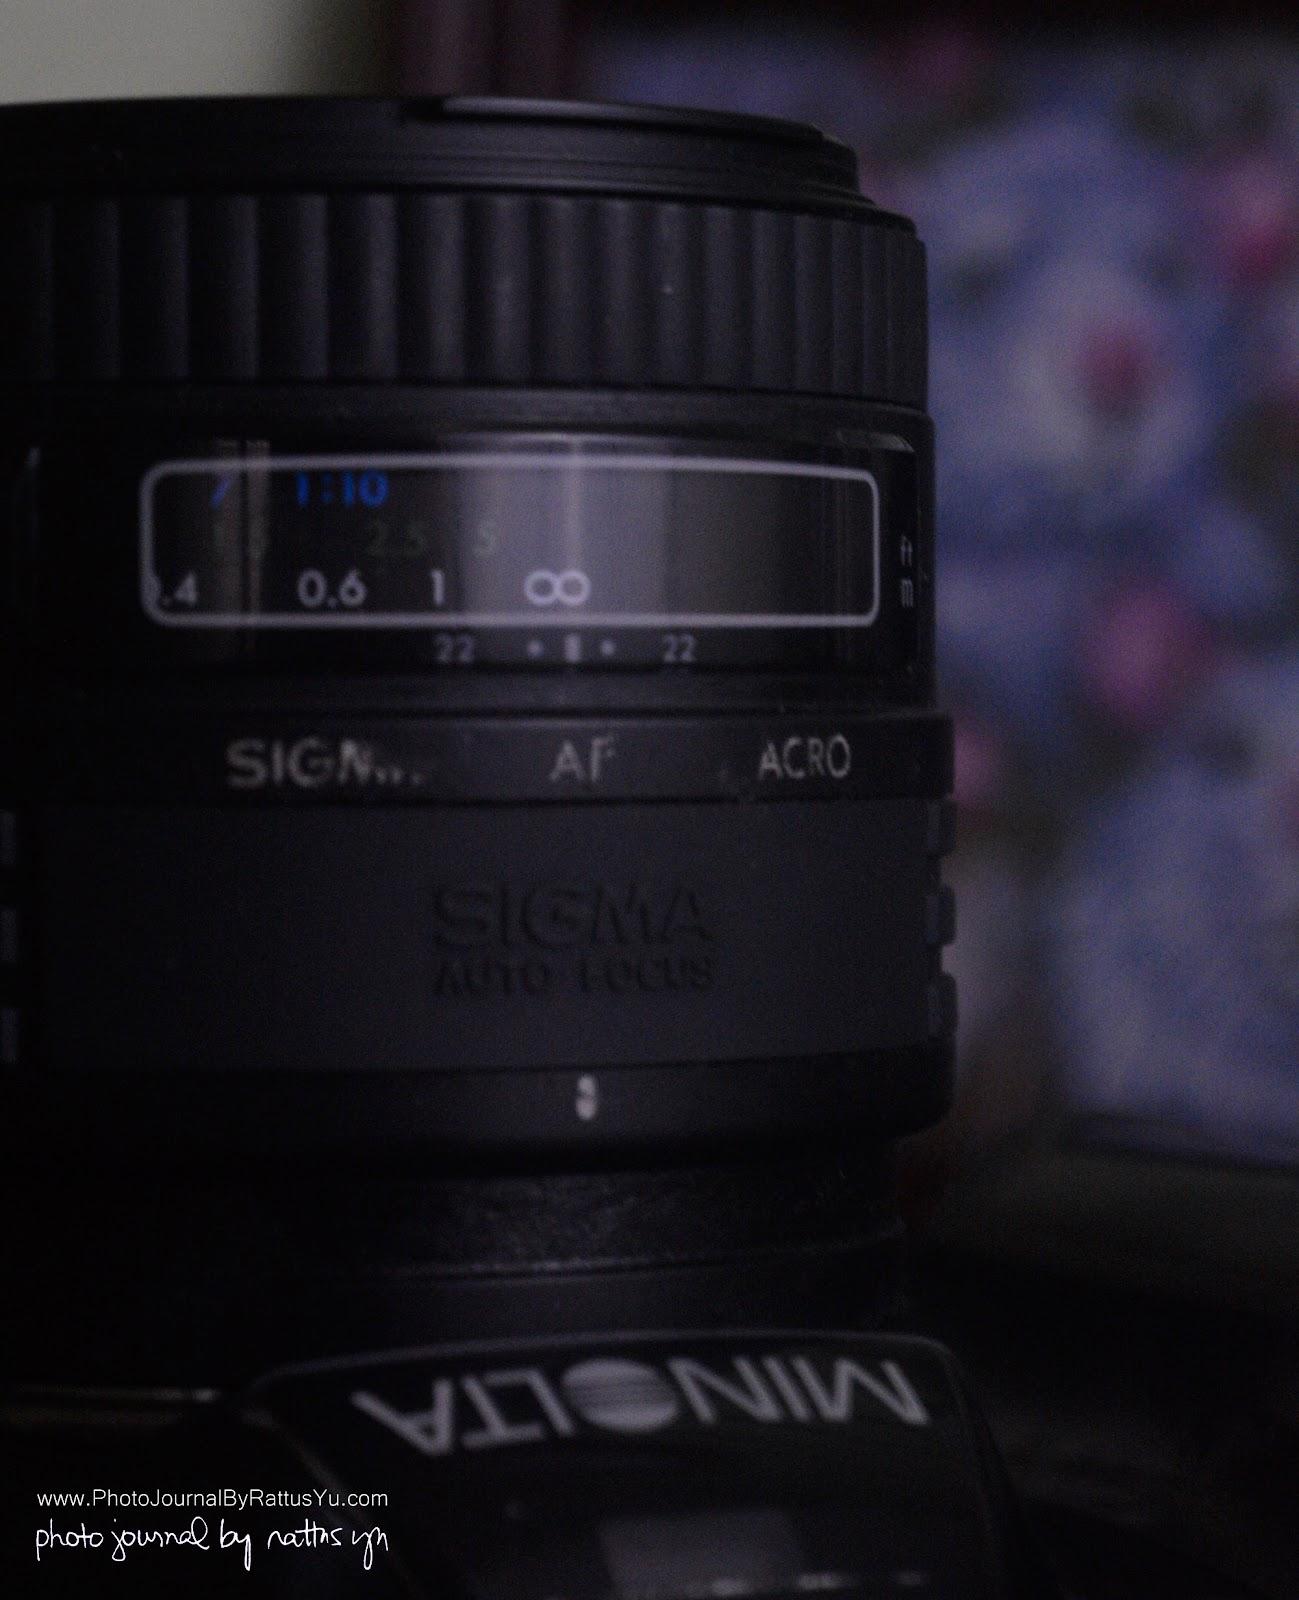 Sigma AF 50mm f/2.8 Macro (Minolta/Sony A Mount)